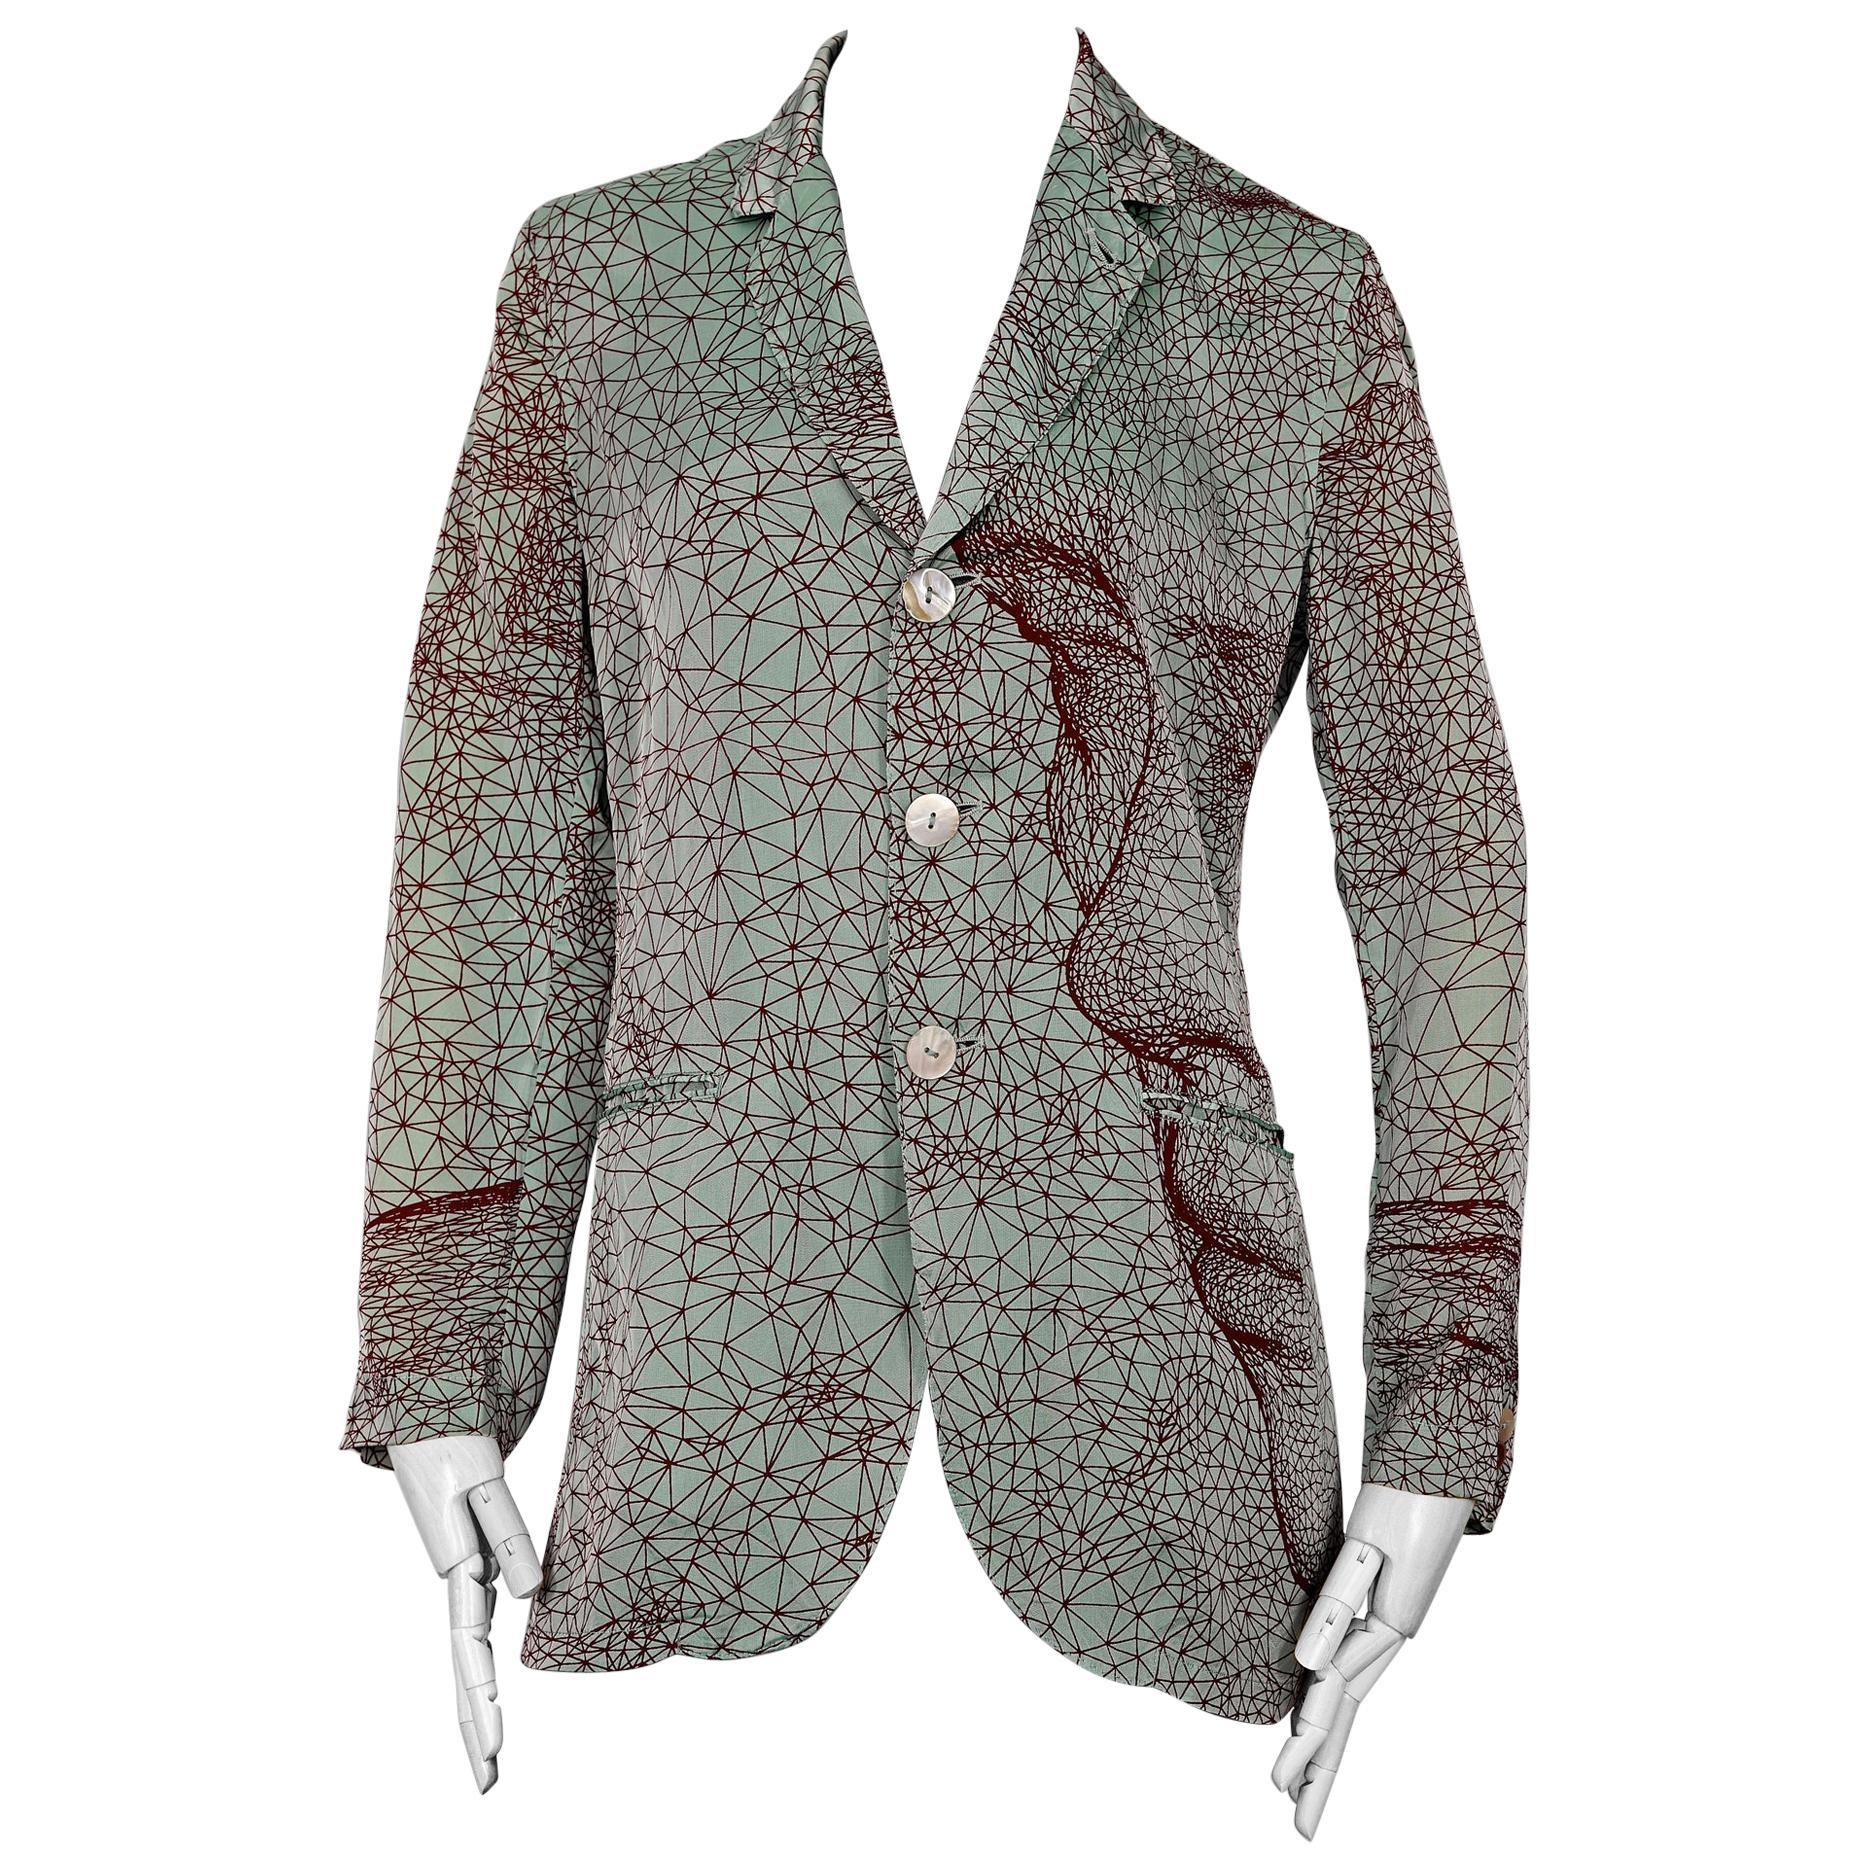 Vintage JEAN PAUL GAULTIER Constellation Face Optic Illusion Shirt Blazer Jacket